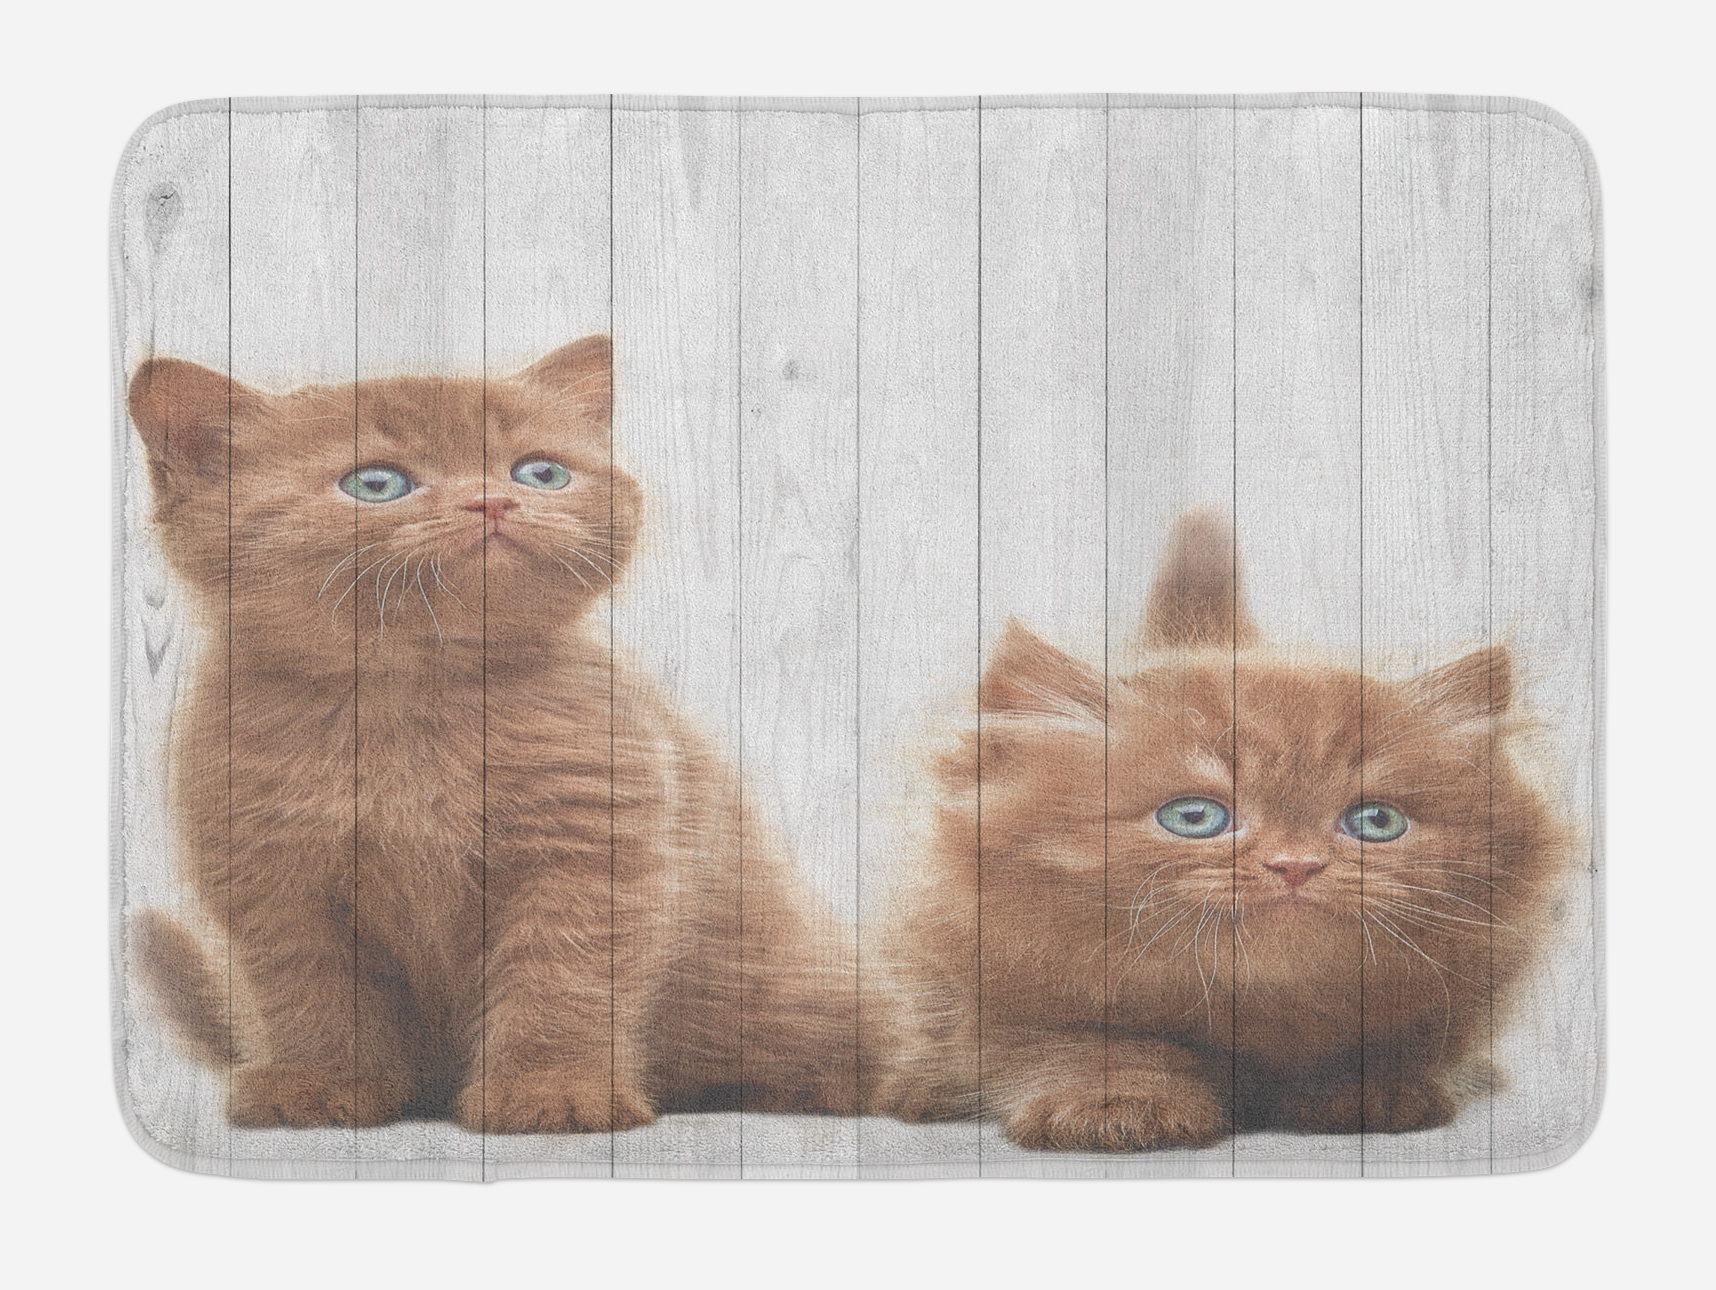 Animal Bath Mat, Cute Kittens Baby Cats Sweet Feline Kids Nursery Child Kitty Theme... by 3decor llc